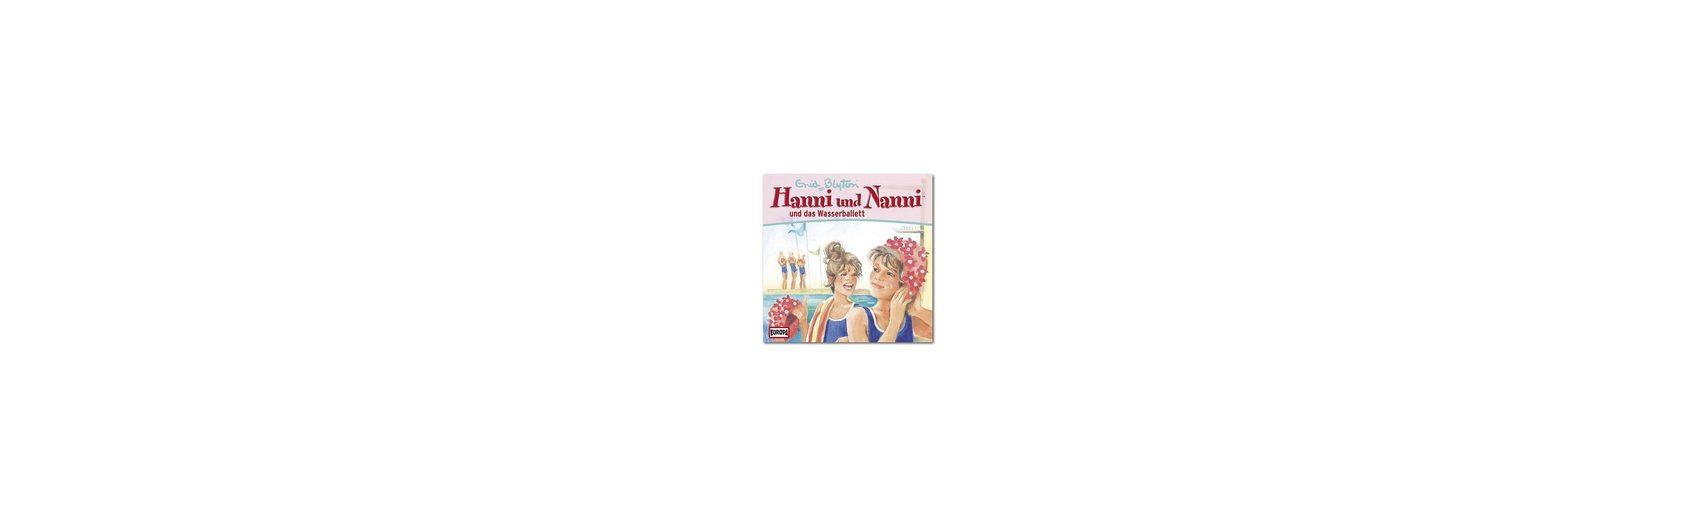 SONY BMG MUSIC CD Hanni & Nanni 24 - das Wasserballett